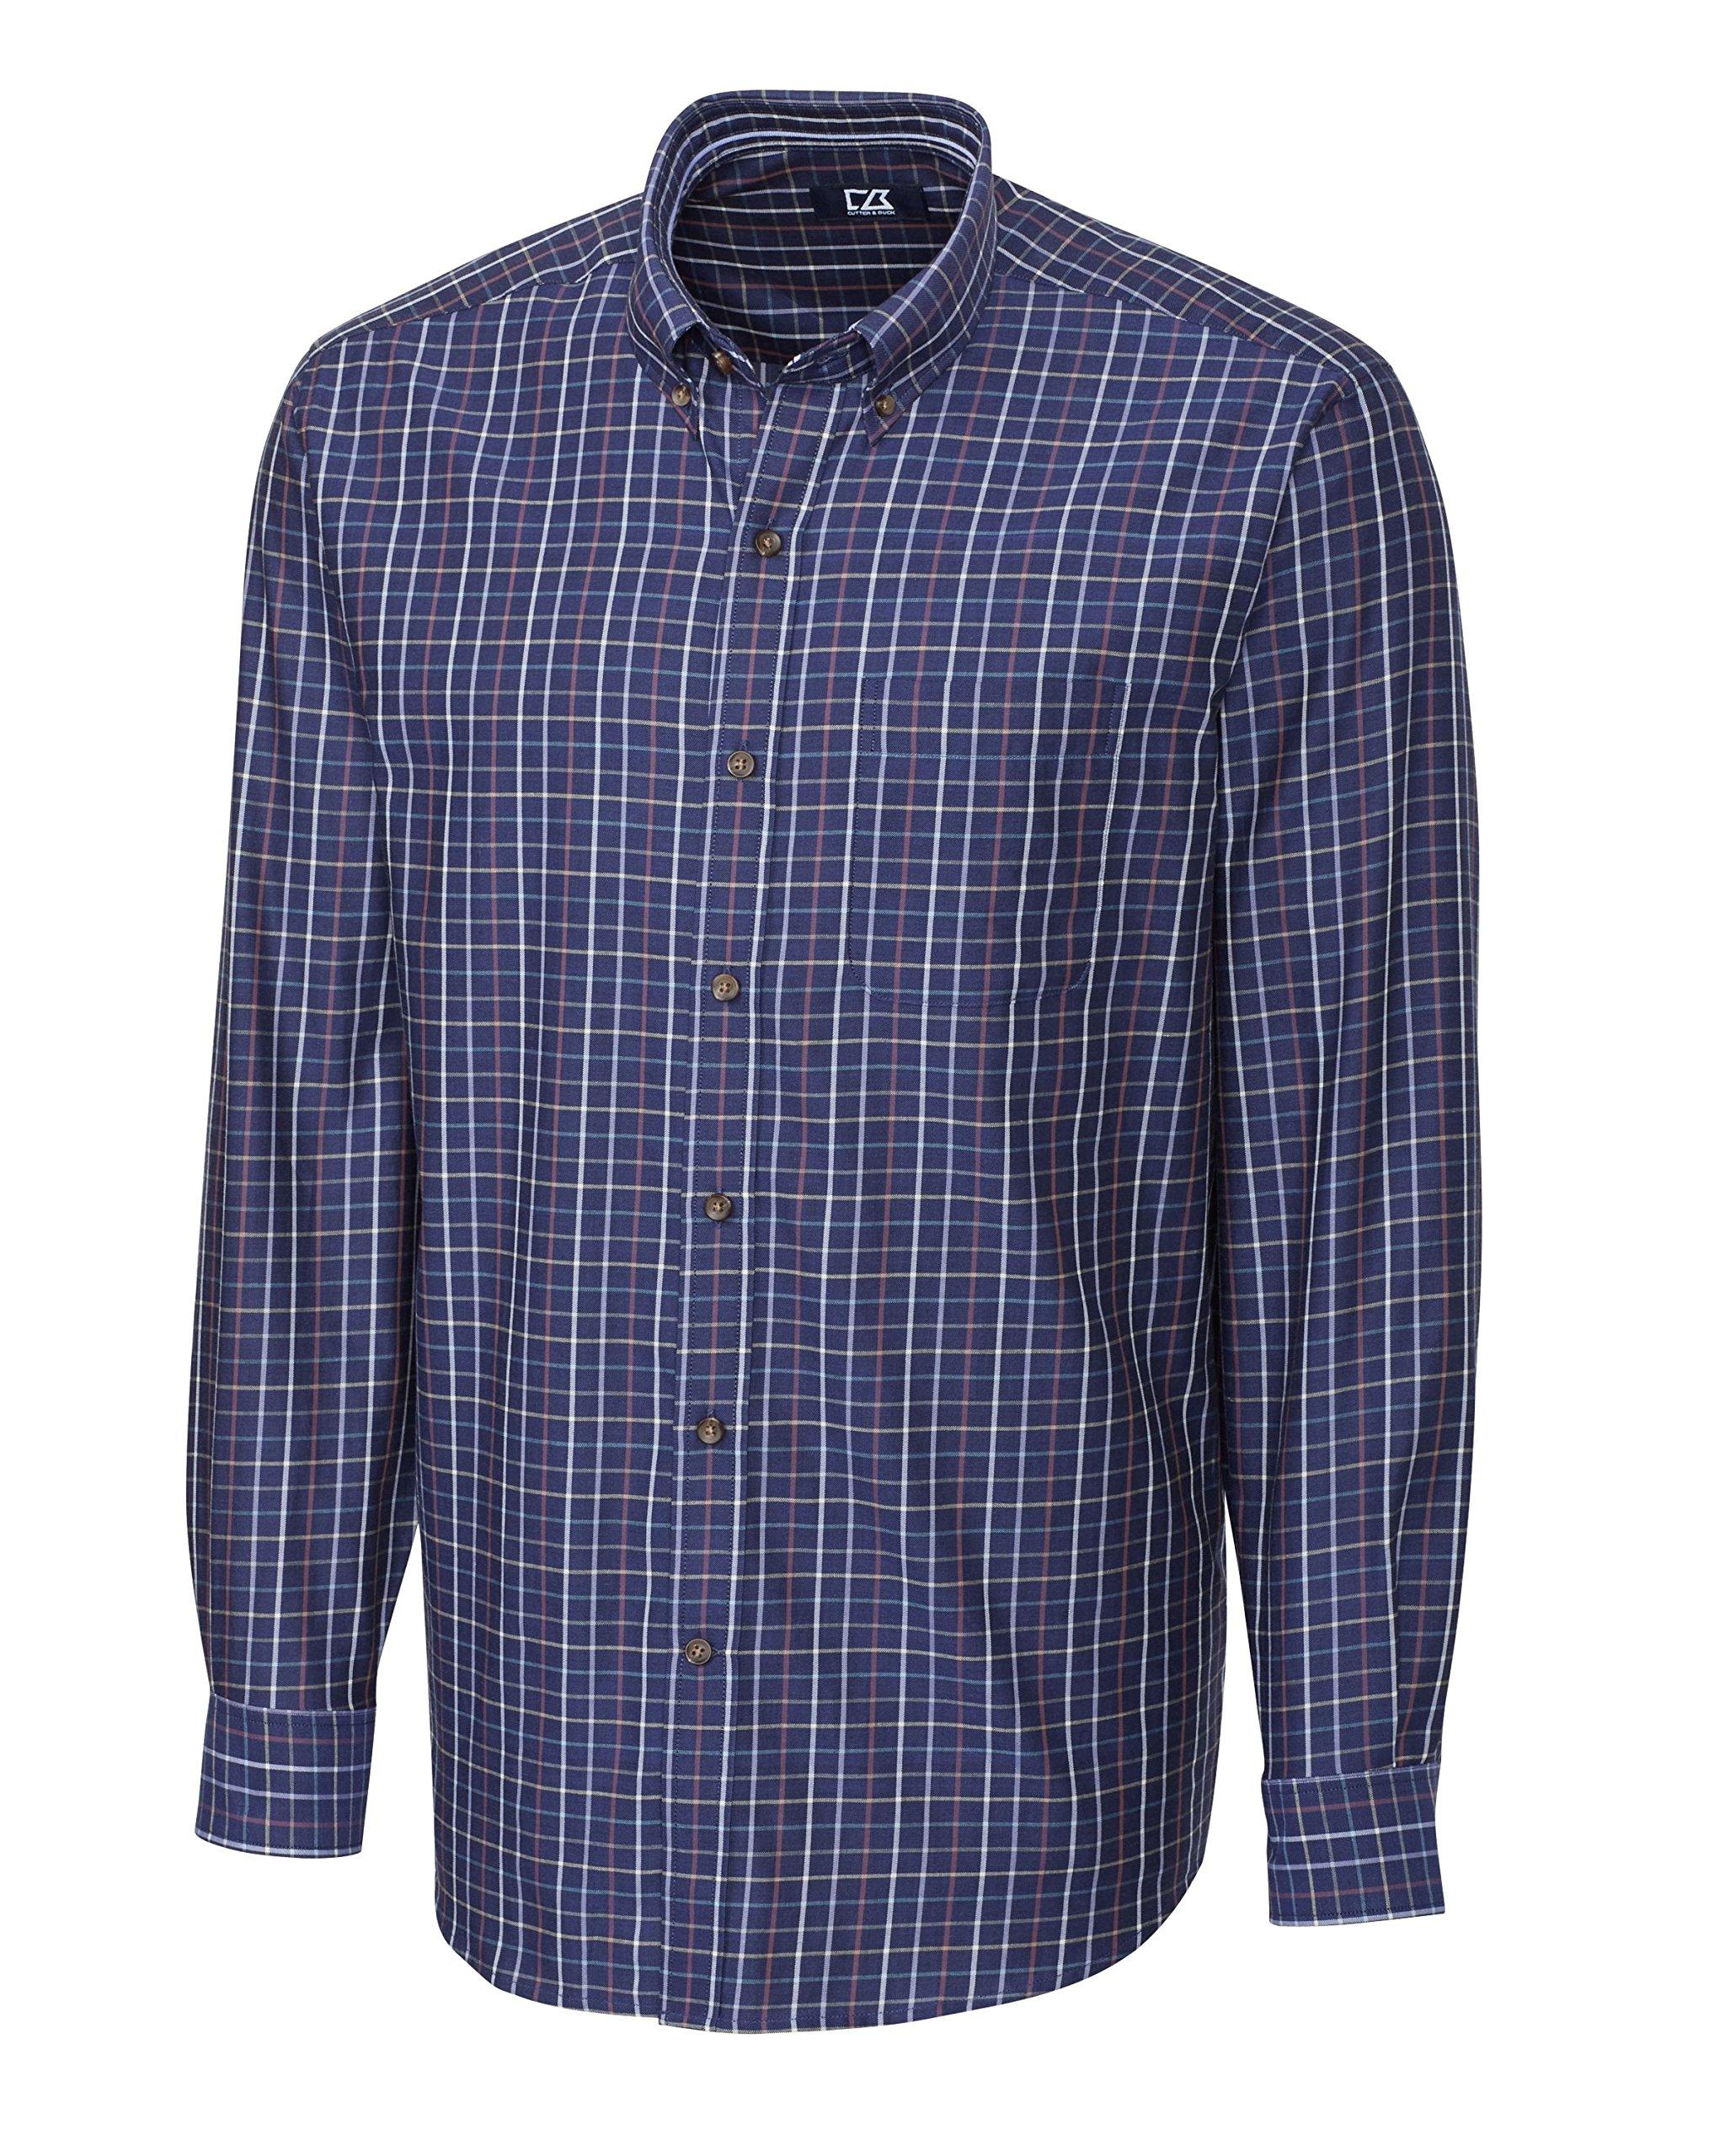 Cutter & Buck Men's Big-Tall Long Sleeve Jackson Plaid Woven Shirt, Multi, 3X/Big